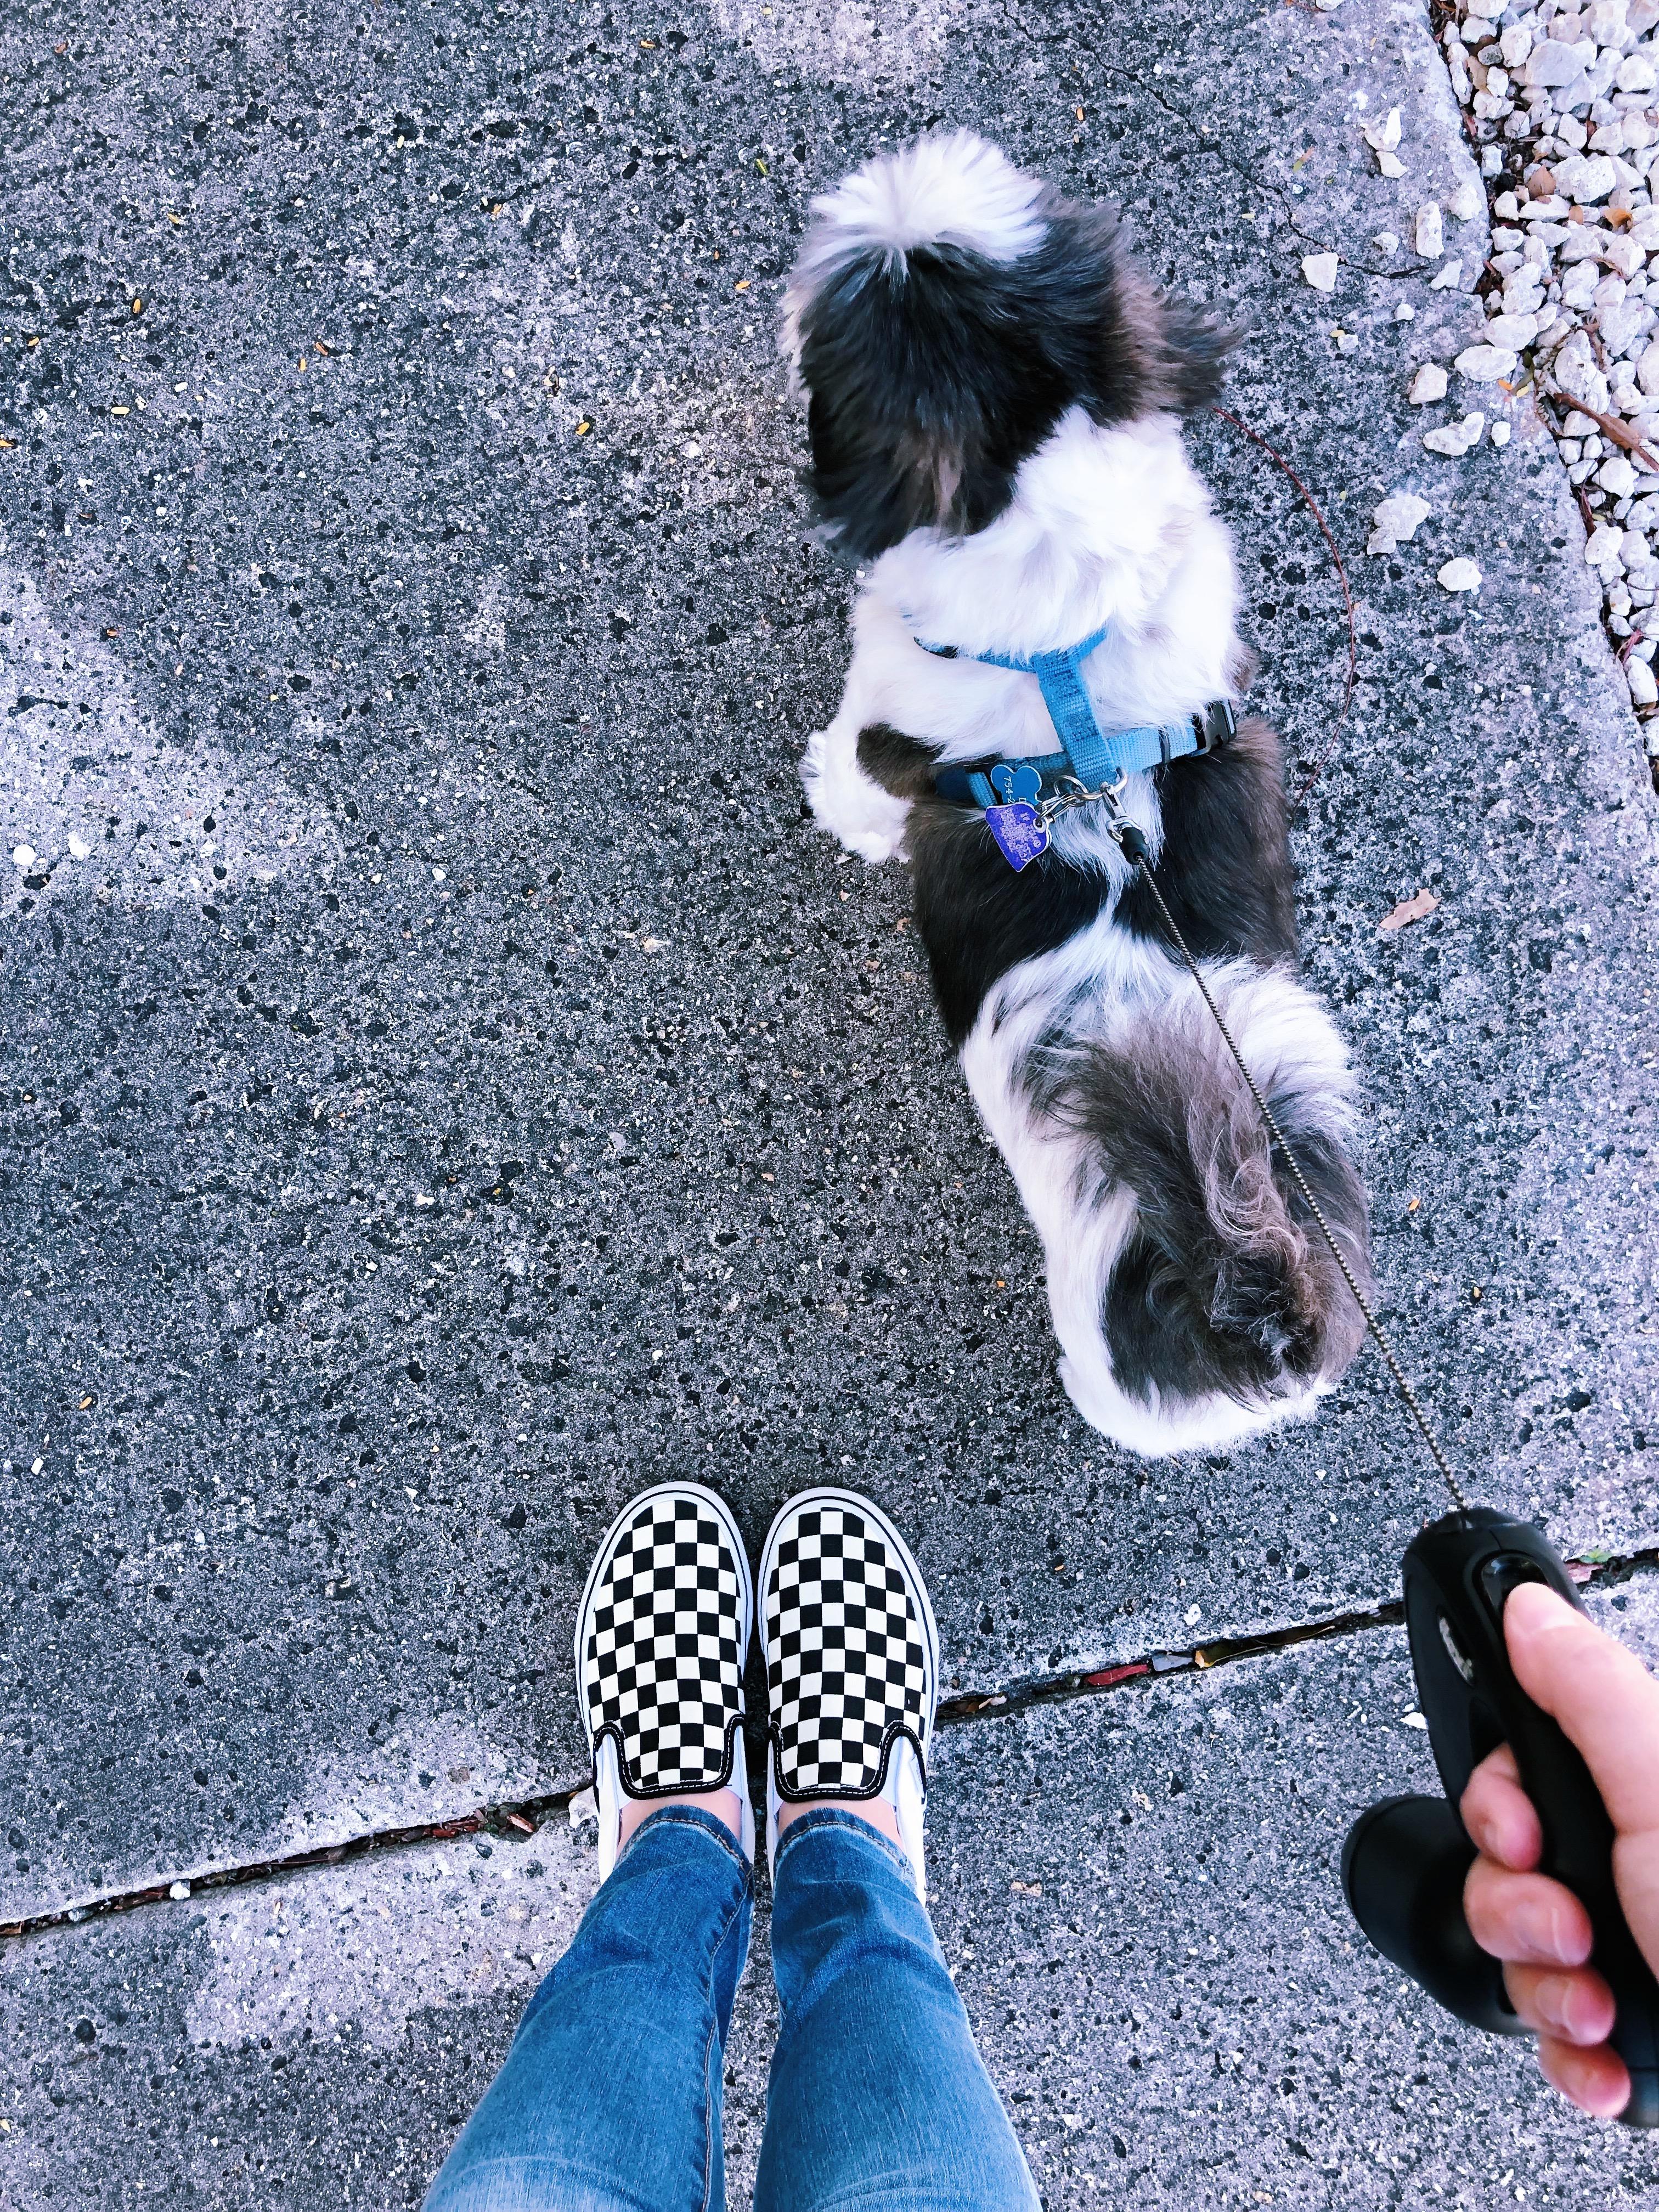 Novelty MONEY K3 FAKE 2-Shih Tzu Pet Dog Animal Dollar Bills Collectible